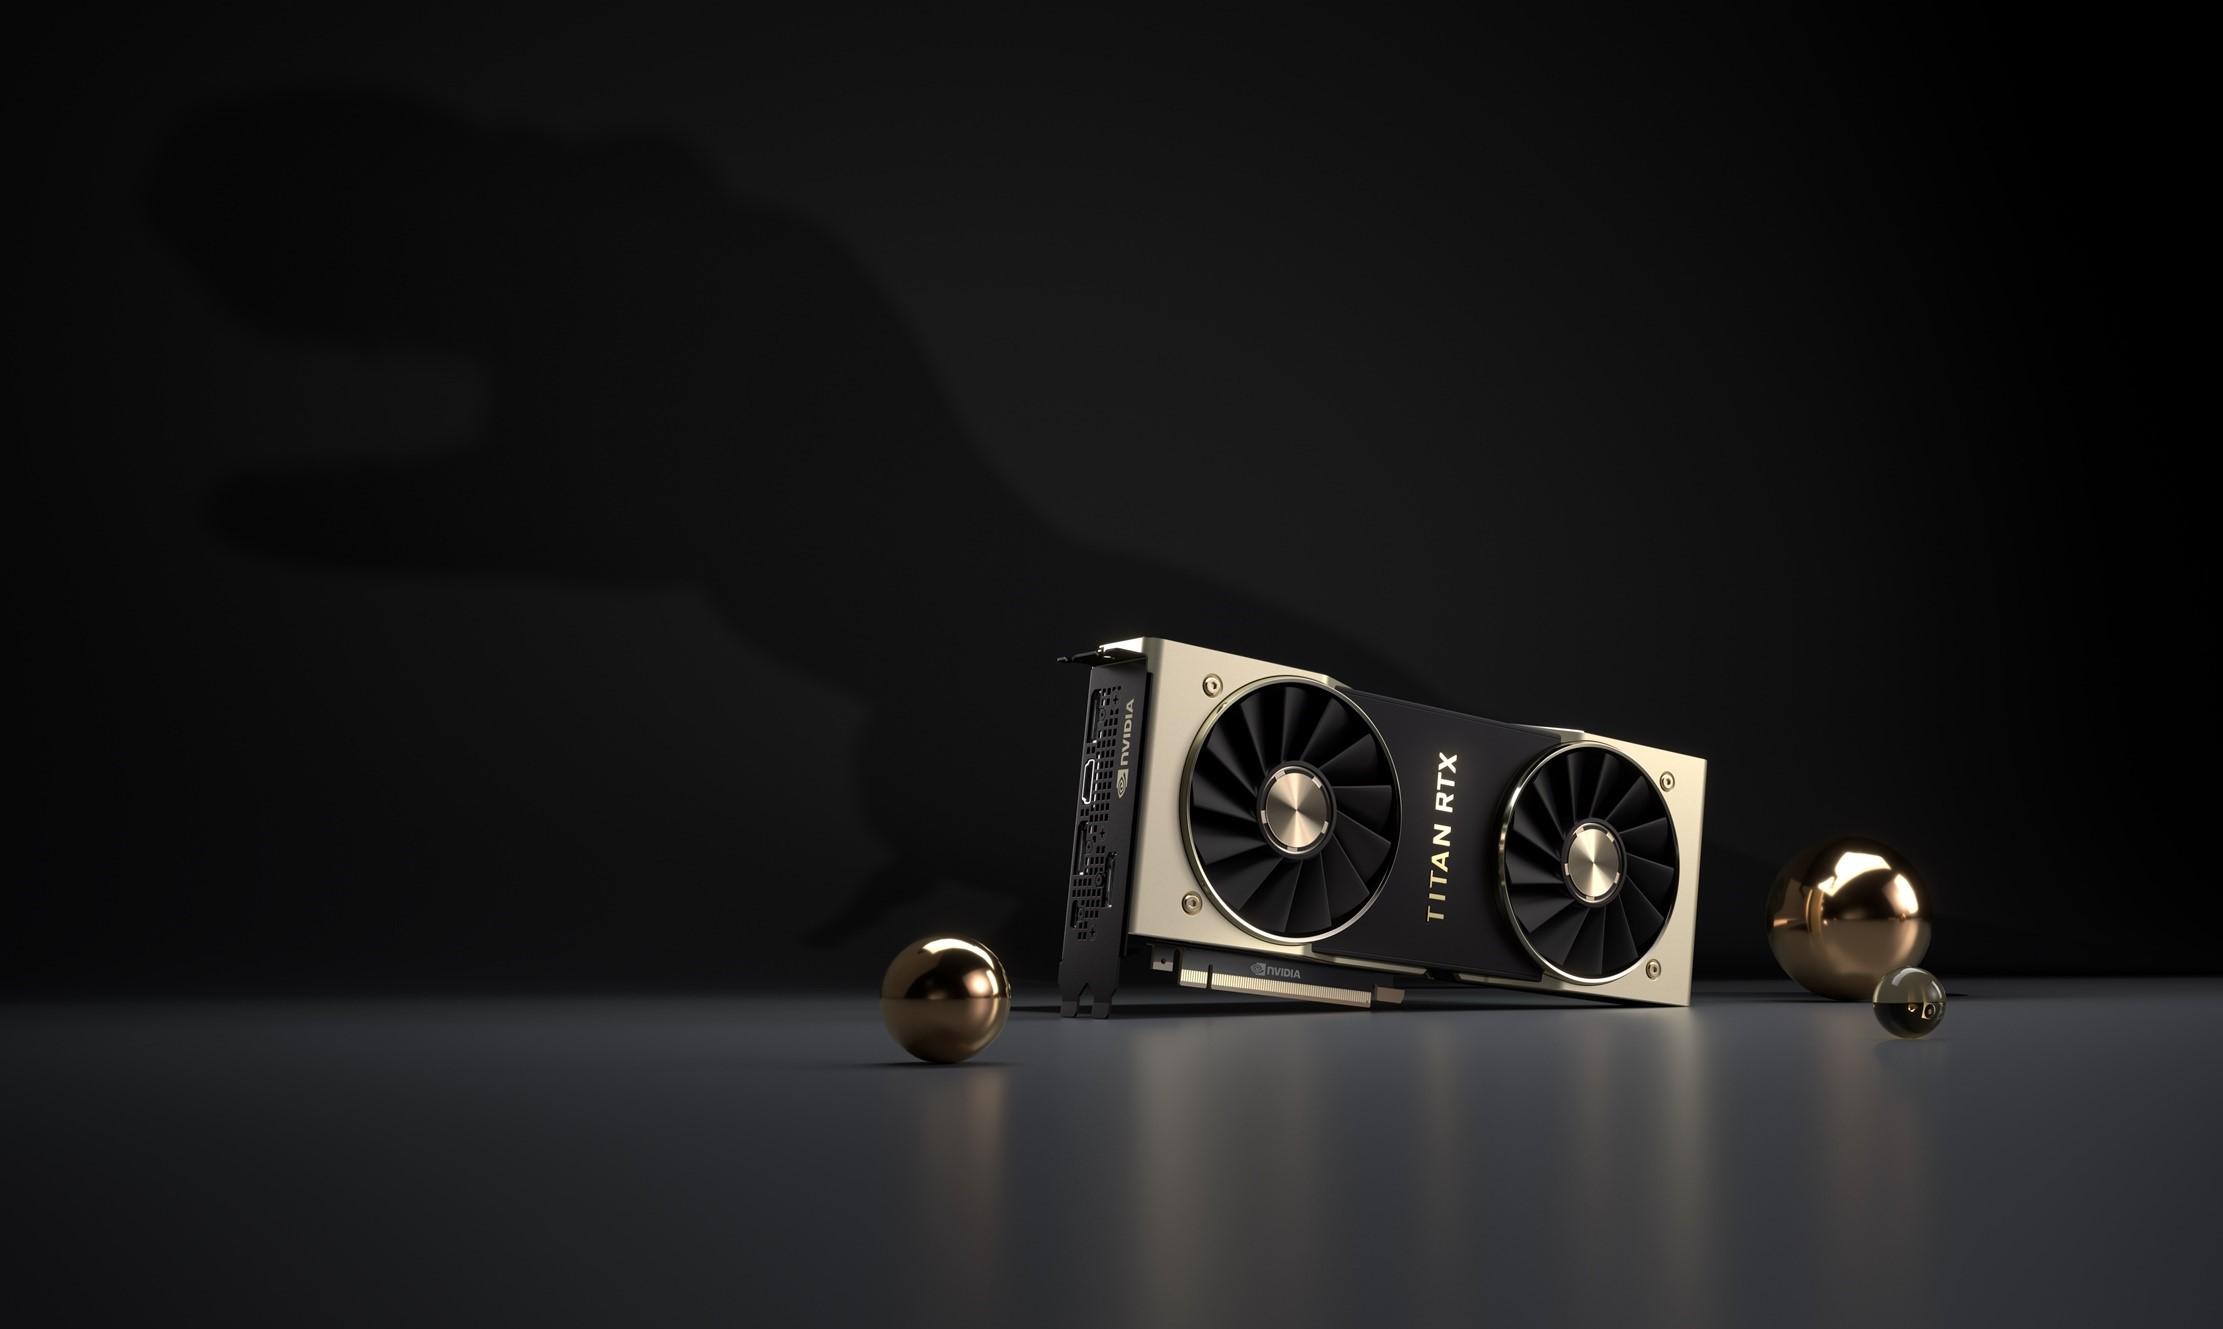 Nvidia Reveals The Titan Of Turing Rtx Gaming Central 15 2009 808 Pm 1963 Circuitbreakeridentificationatjpg